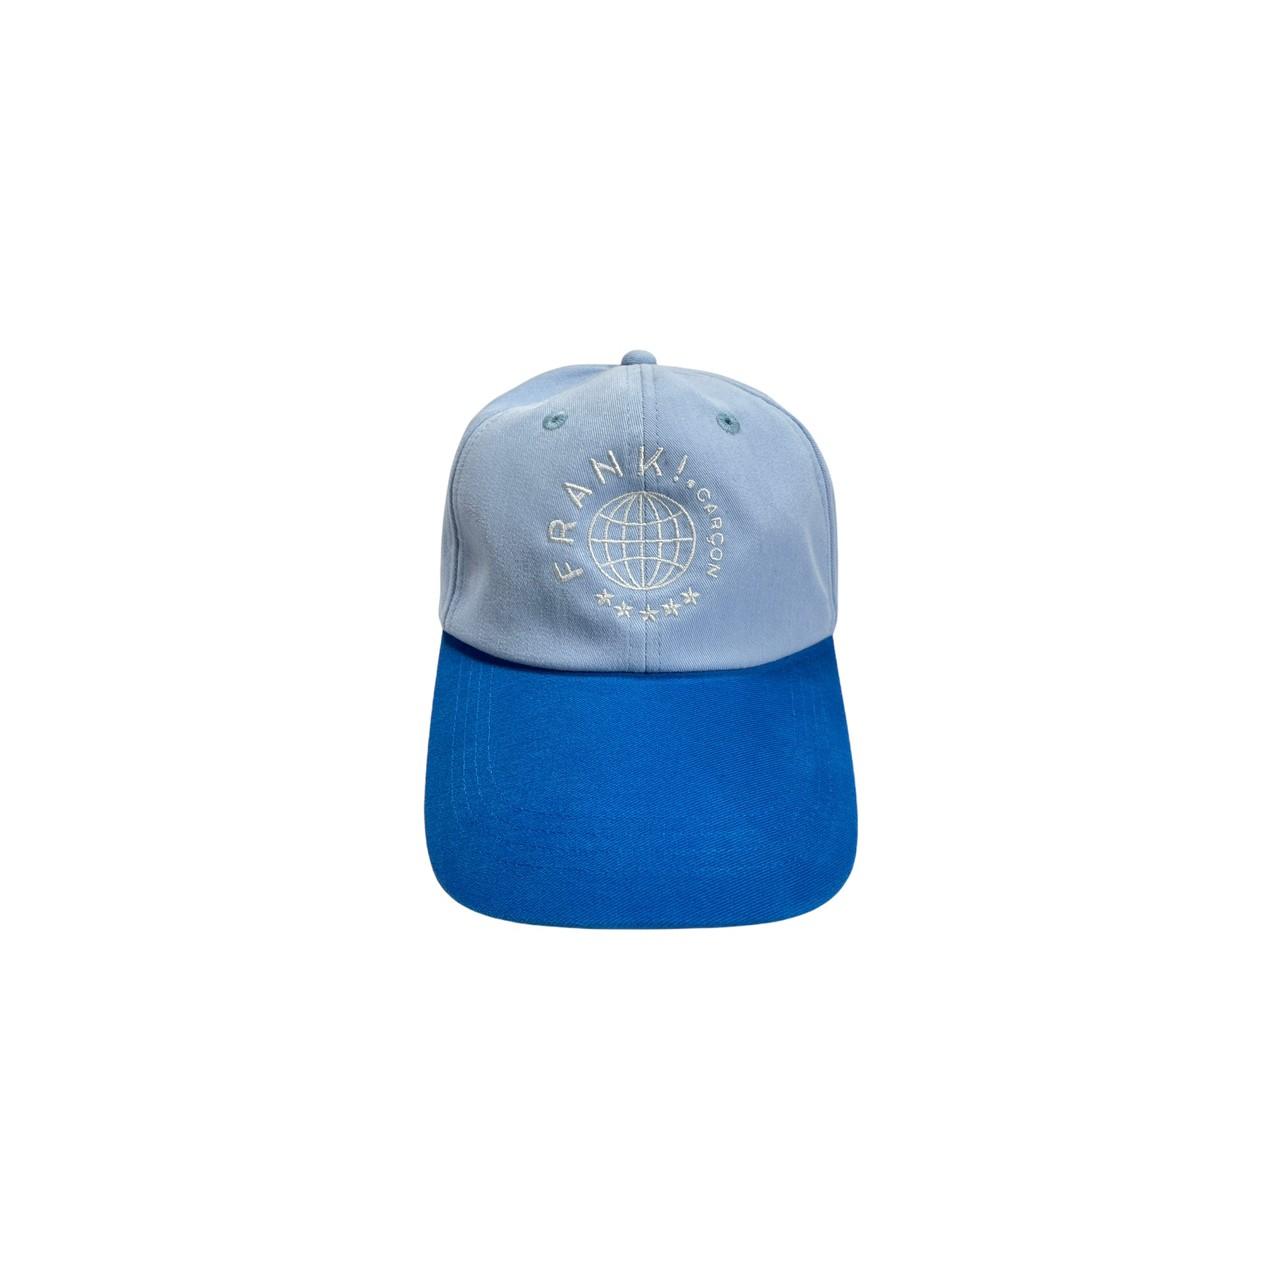 Eric two-tone cap (Blue)